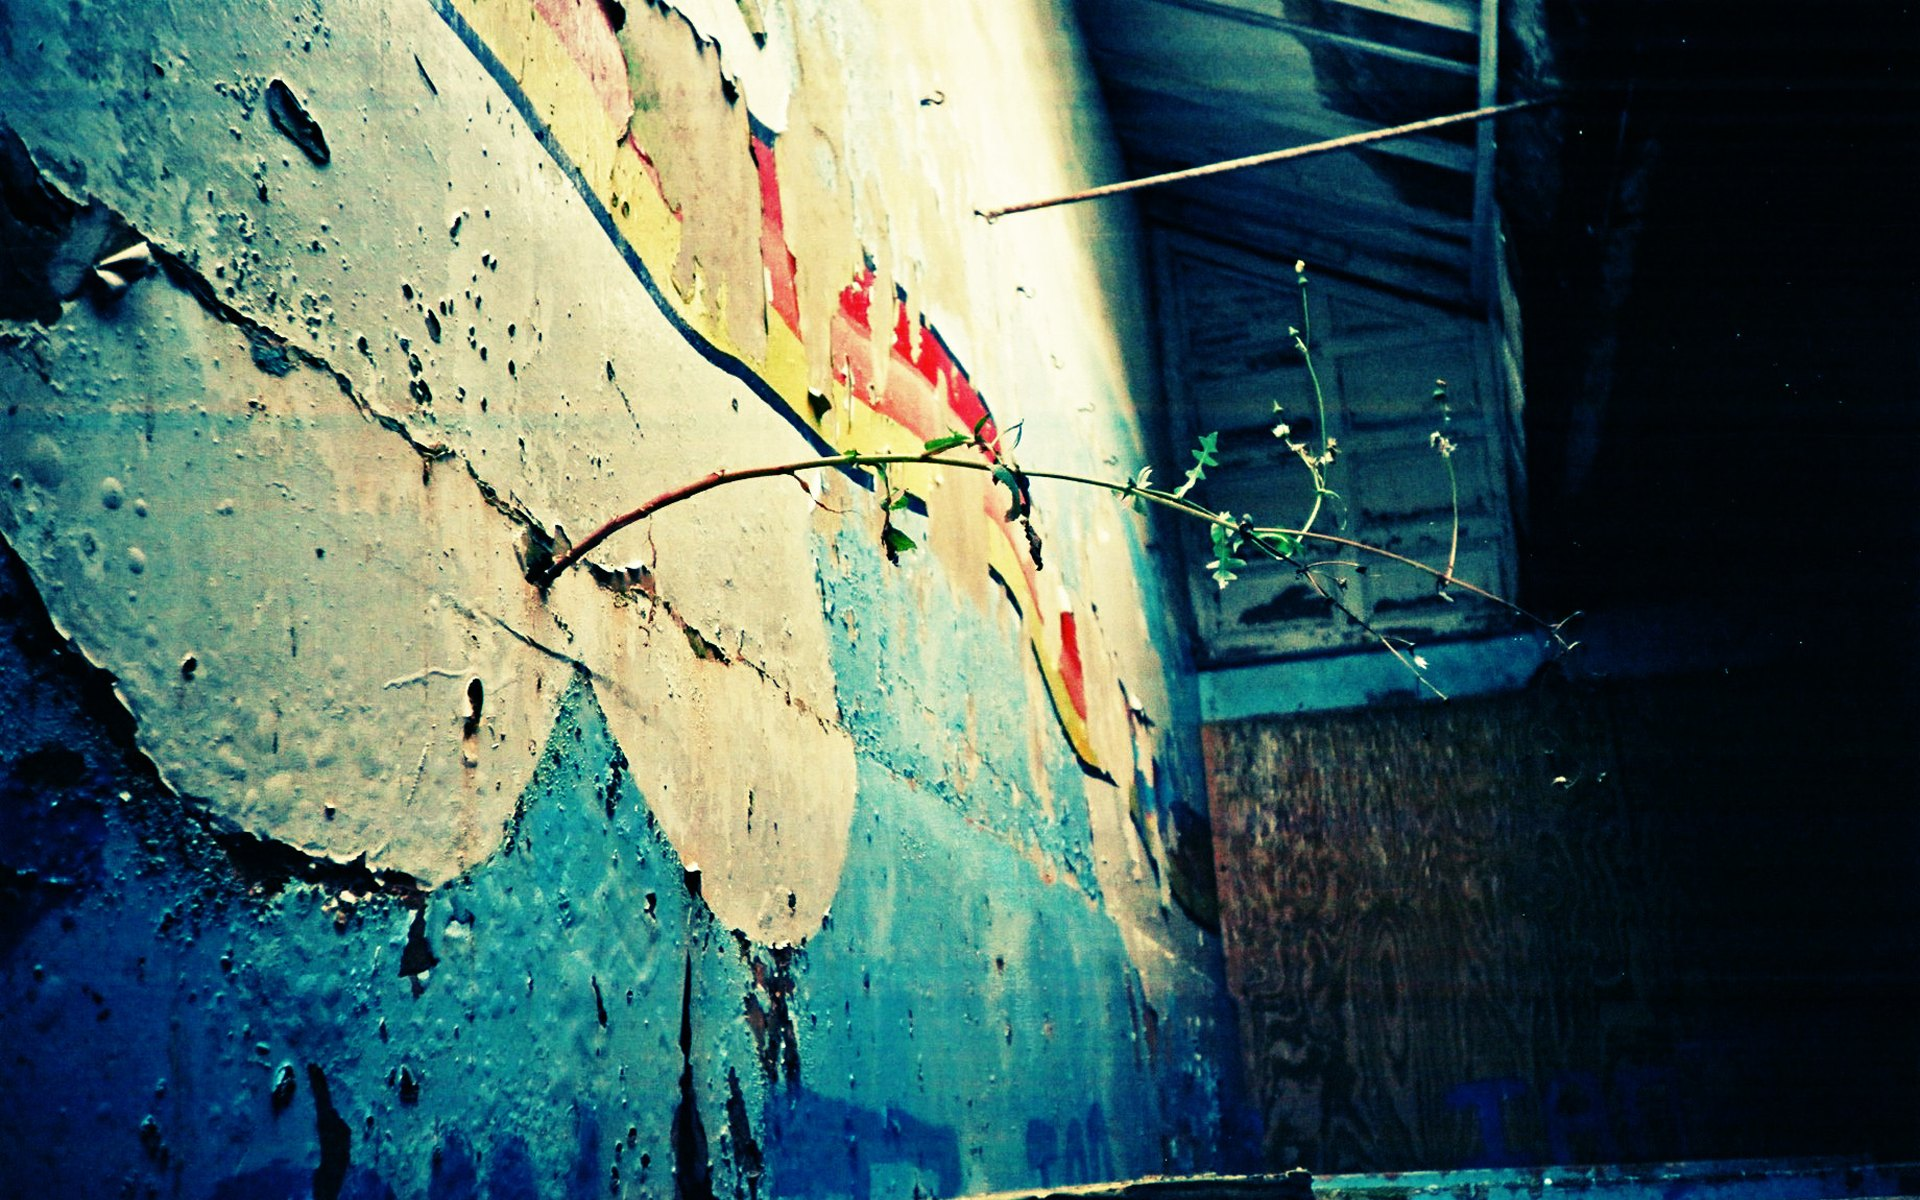 in Crack HD Natural Scenery Wallpaper Wallpaper World 1920x1200